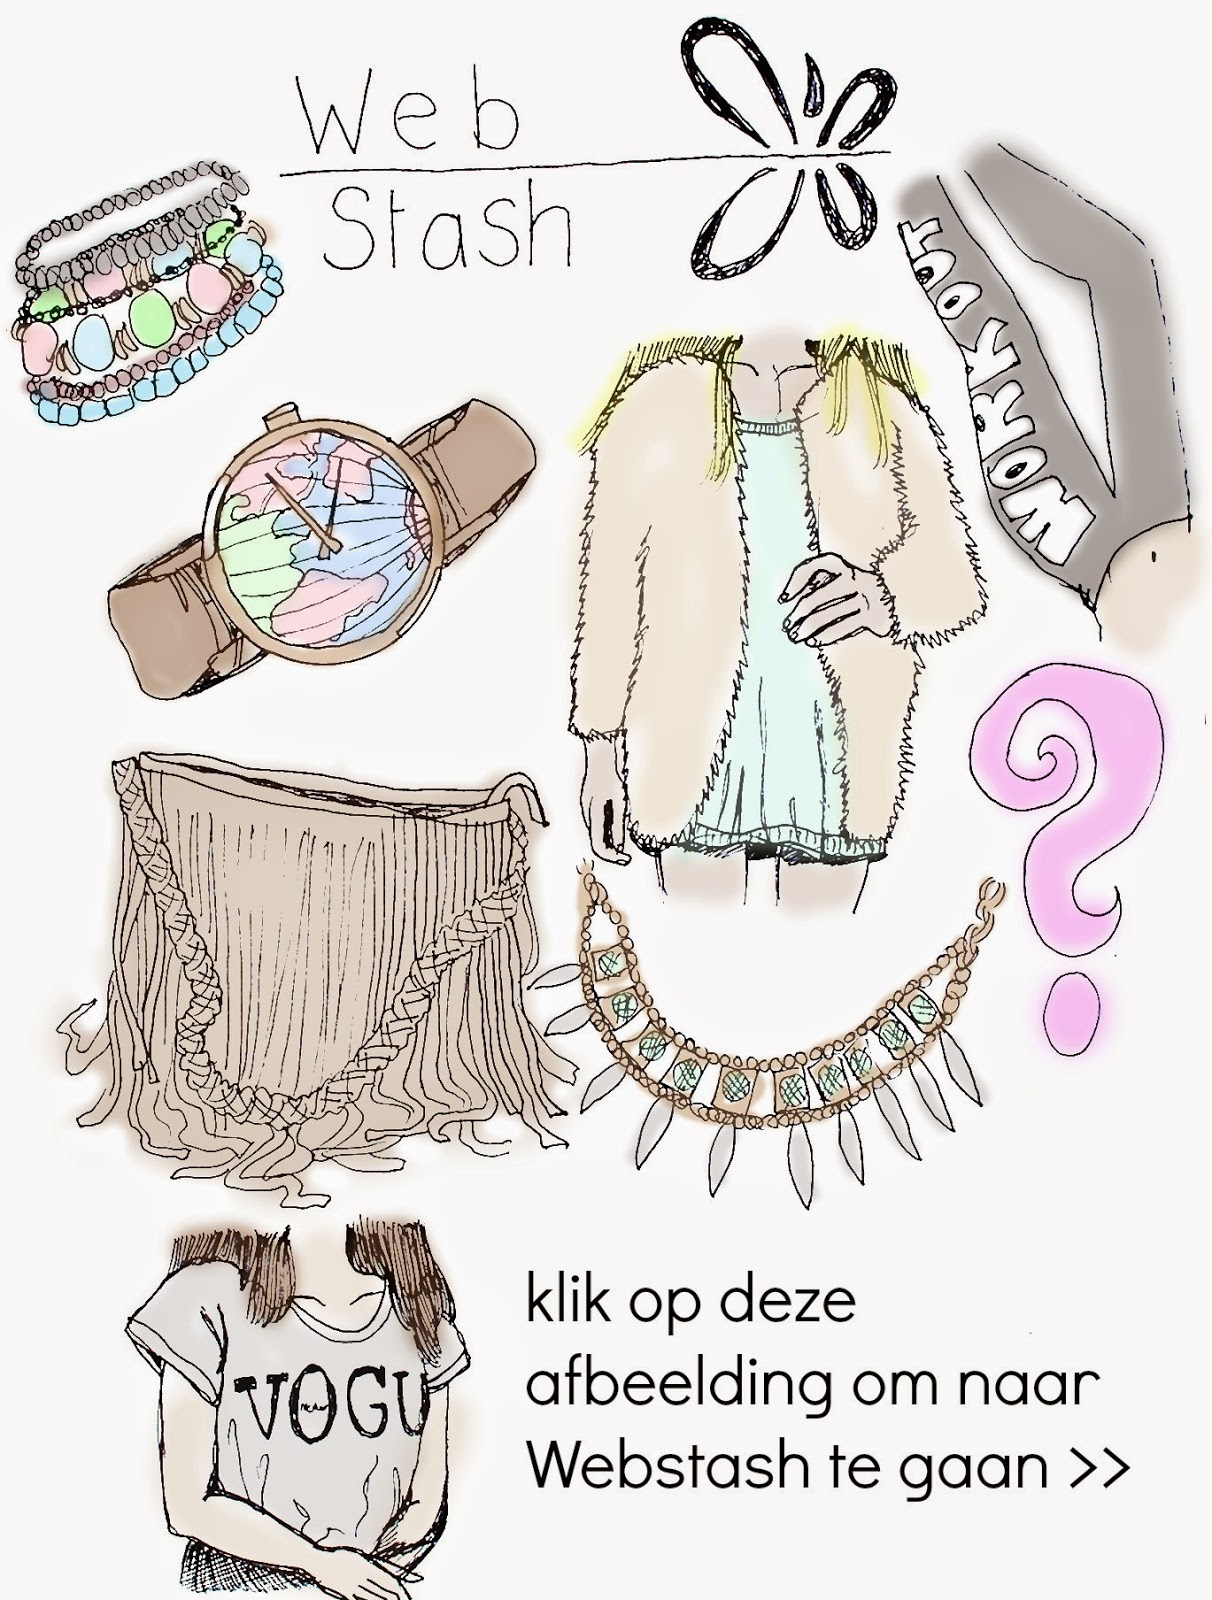 www.webstash.nl